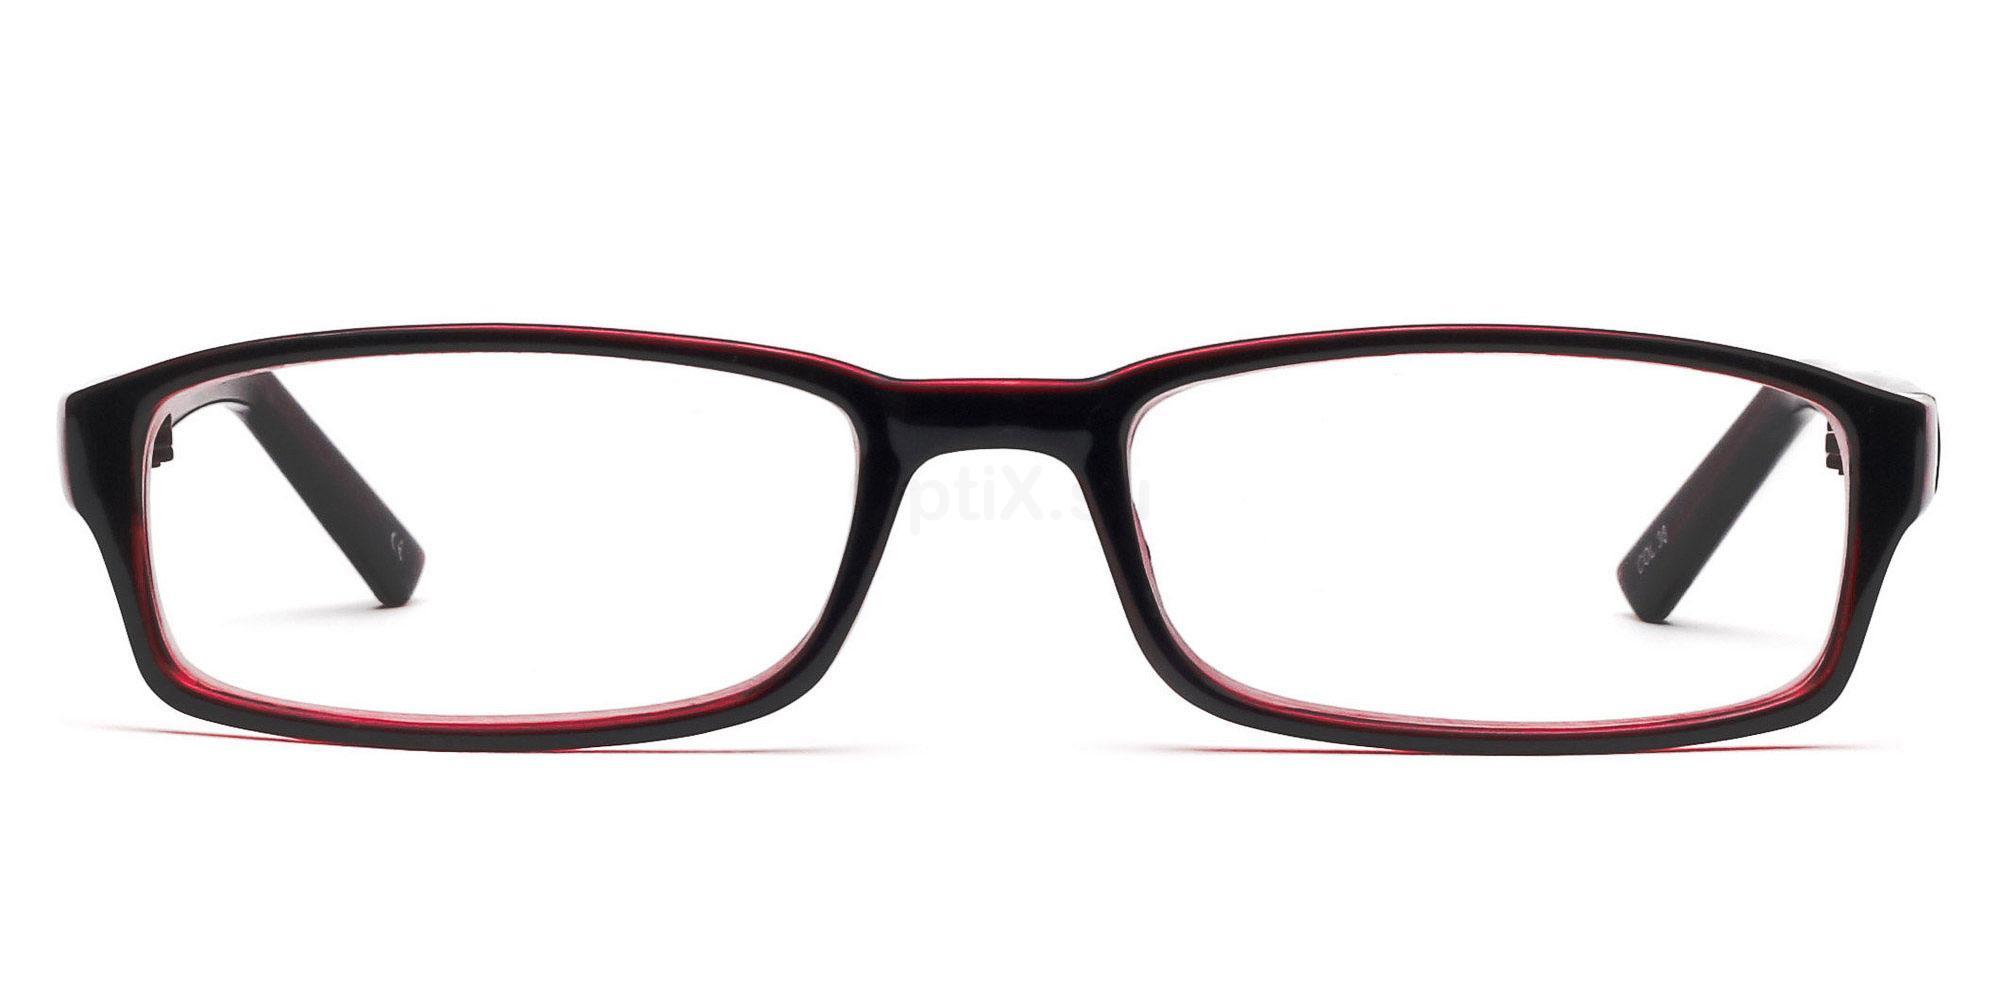 COL.38 2264 - Black and Red Glasses, Savannah